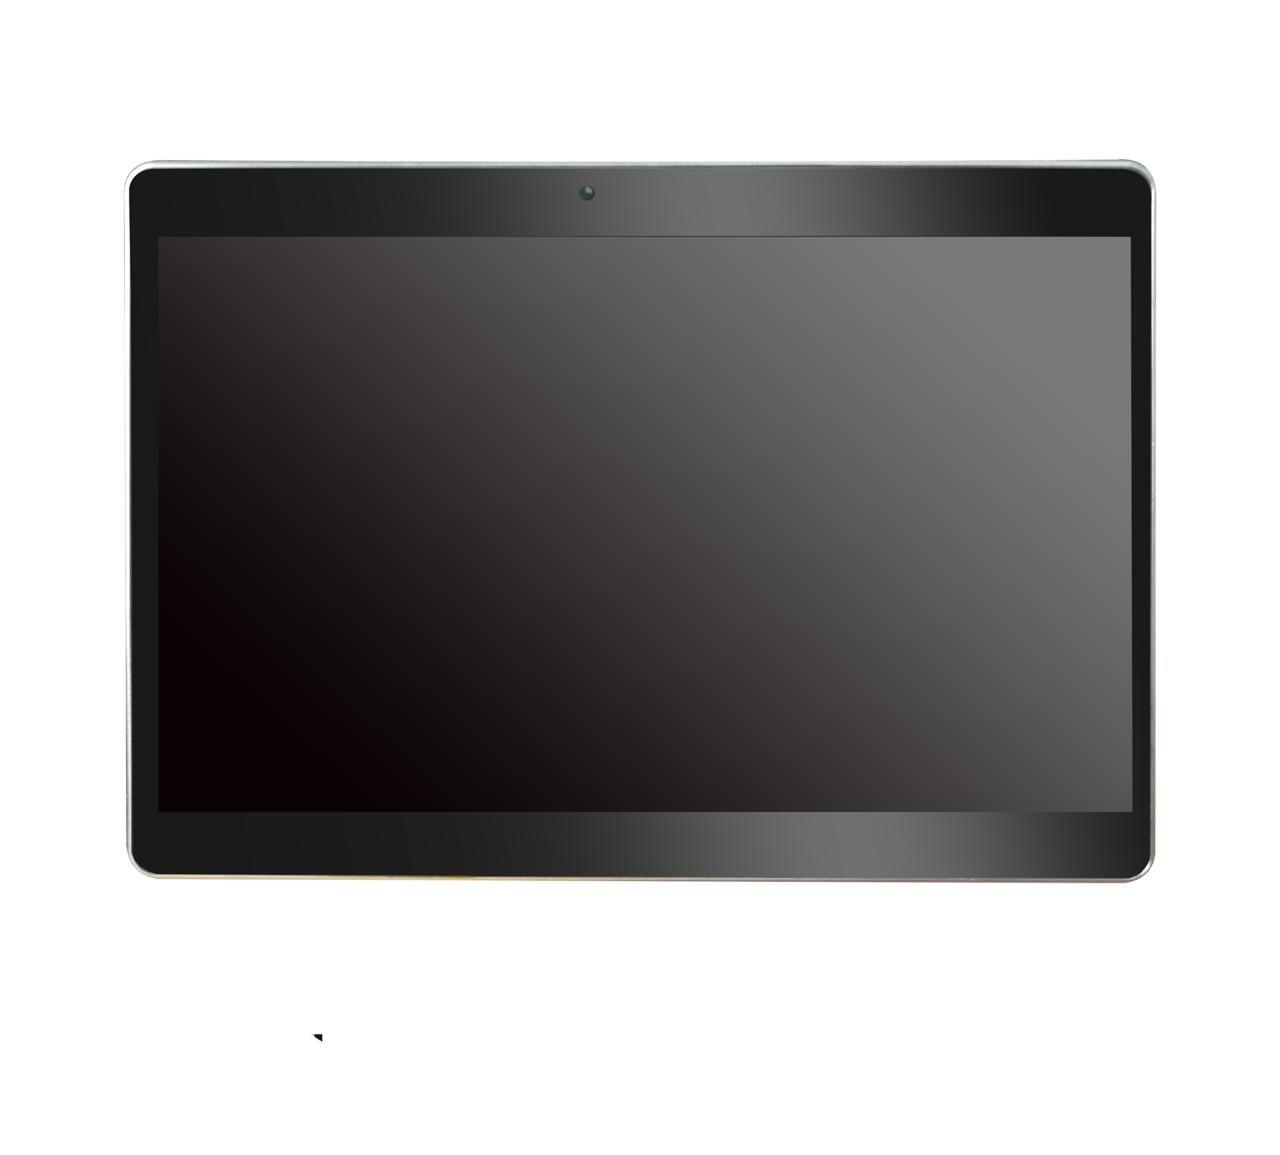 "Tablet 10"" Polegadas Android USB Câmera Frontal Full Touch H-Tech"